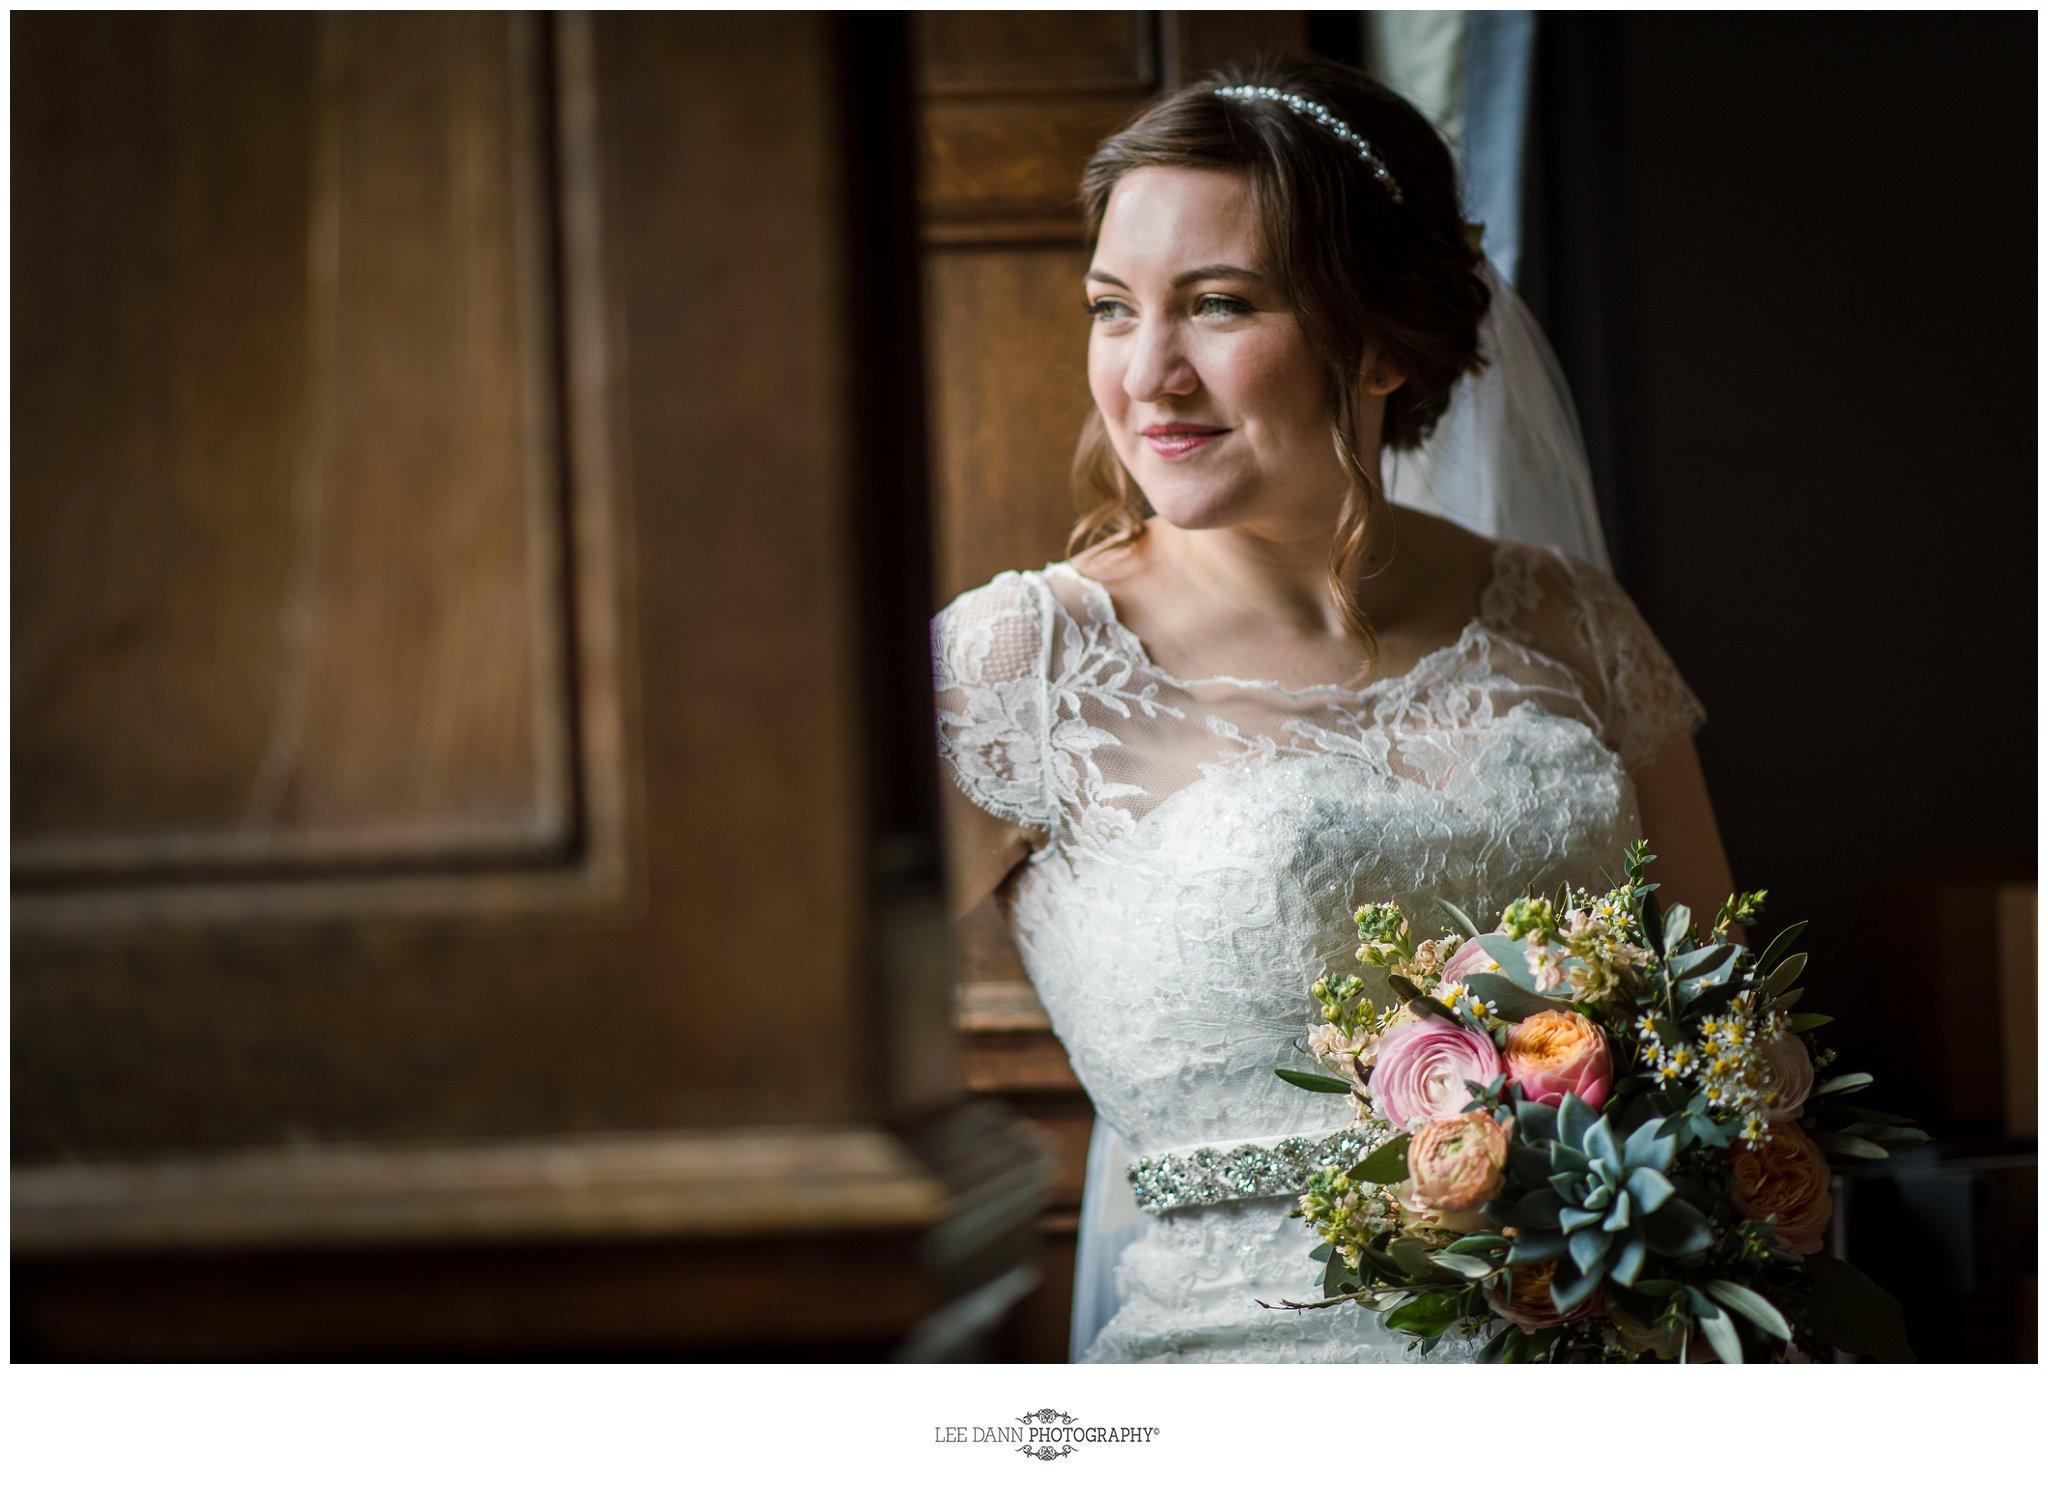 Kathryn&Christopherwedding-TrinityCollege-1stApril2017-1247